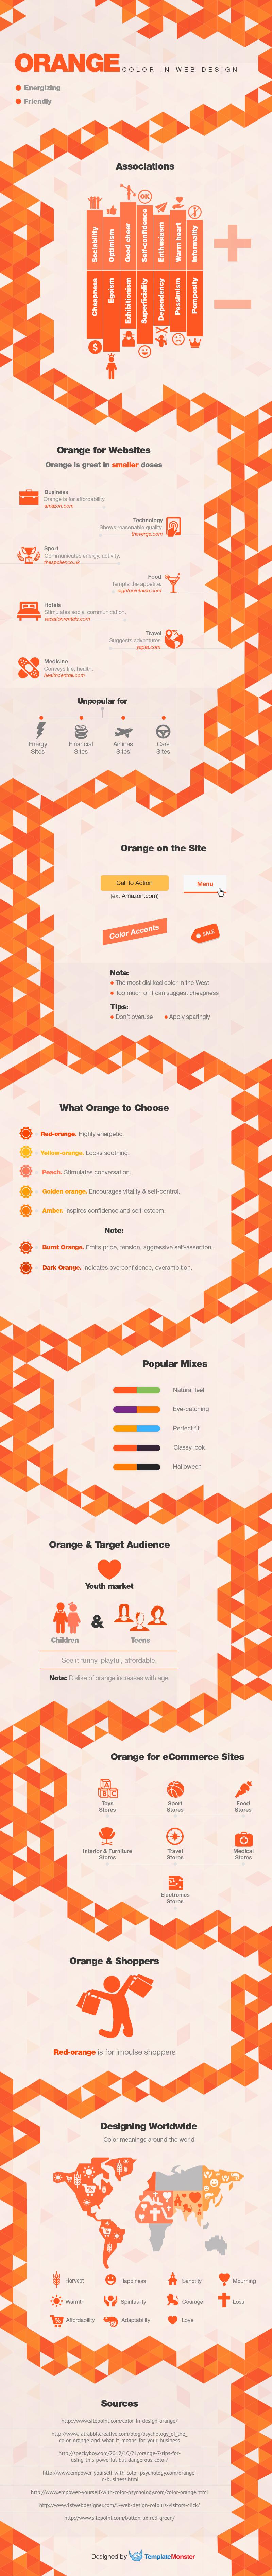 Color naranja en Diseño web